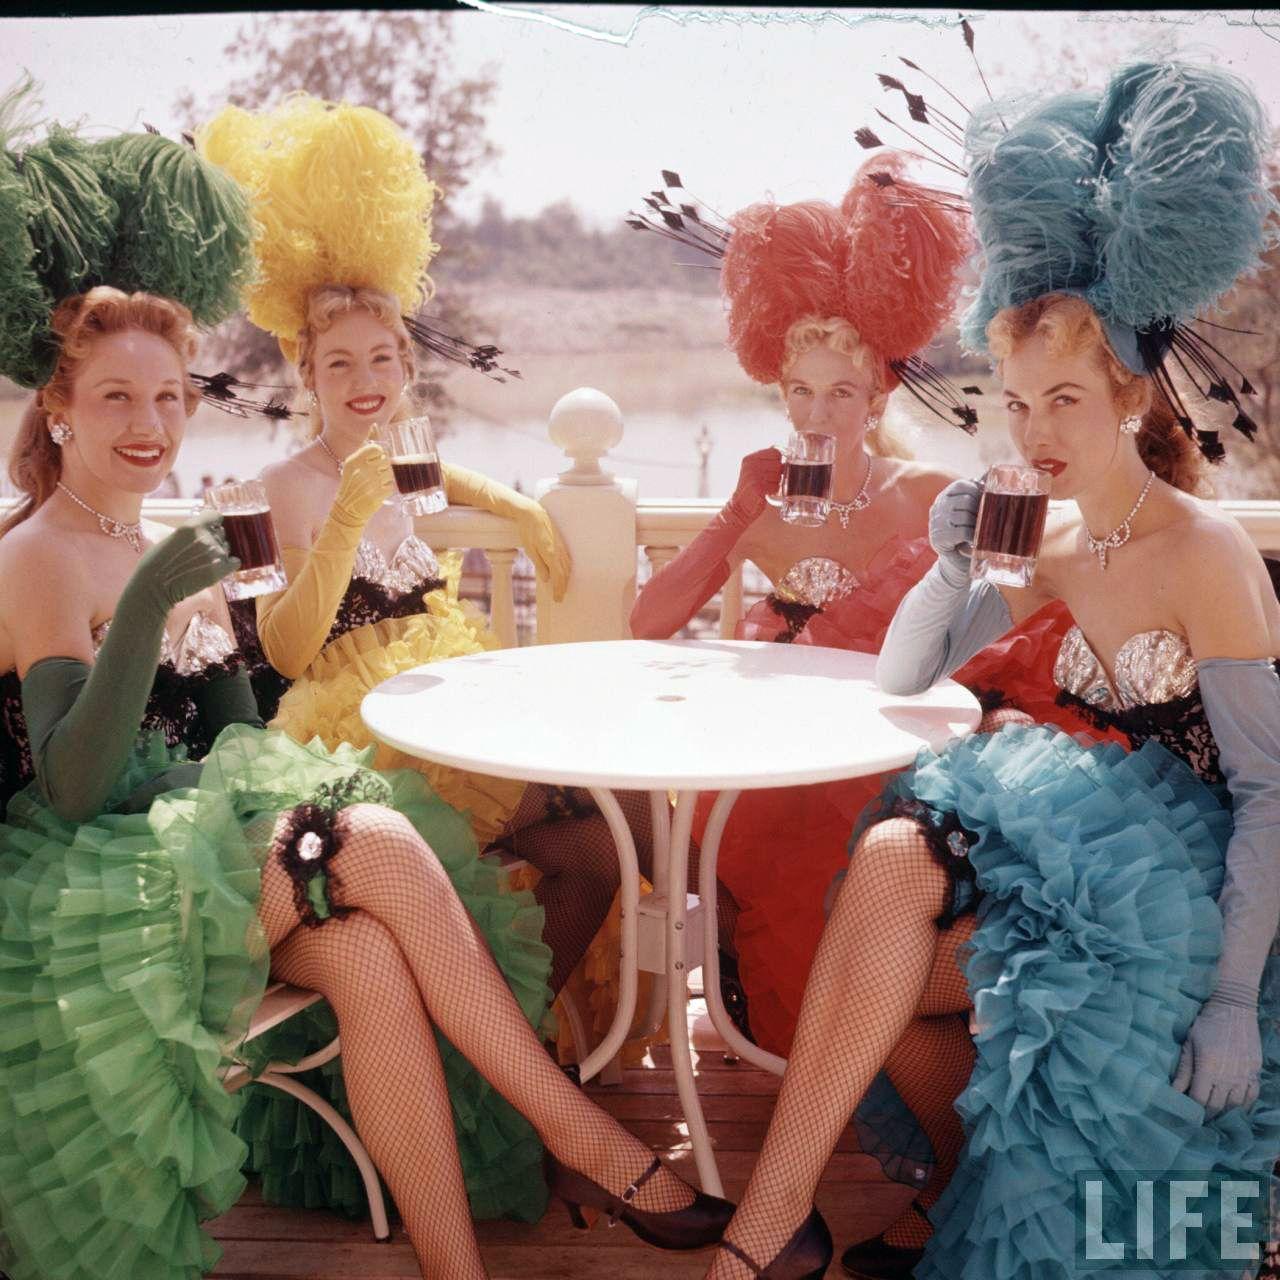 Disneyland Chorus Girls Enjoying A Beverage Above The - 18 amazing rare colour photos disneyland 1955